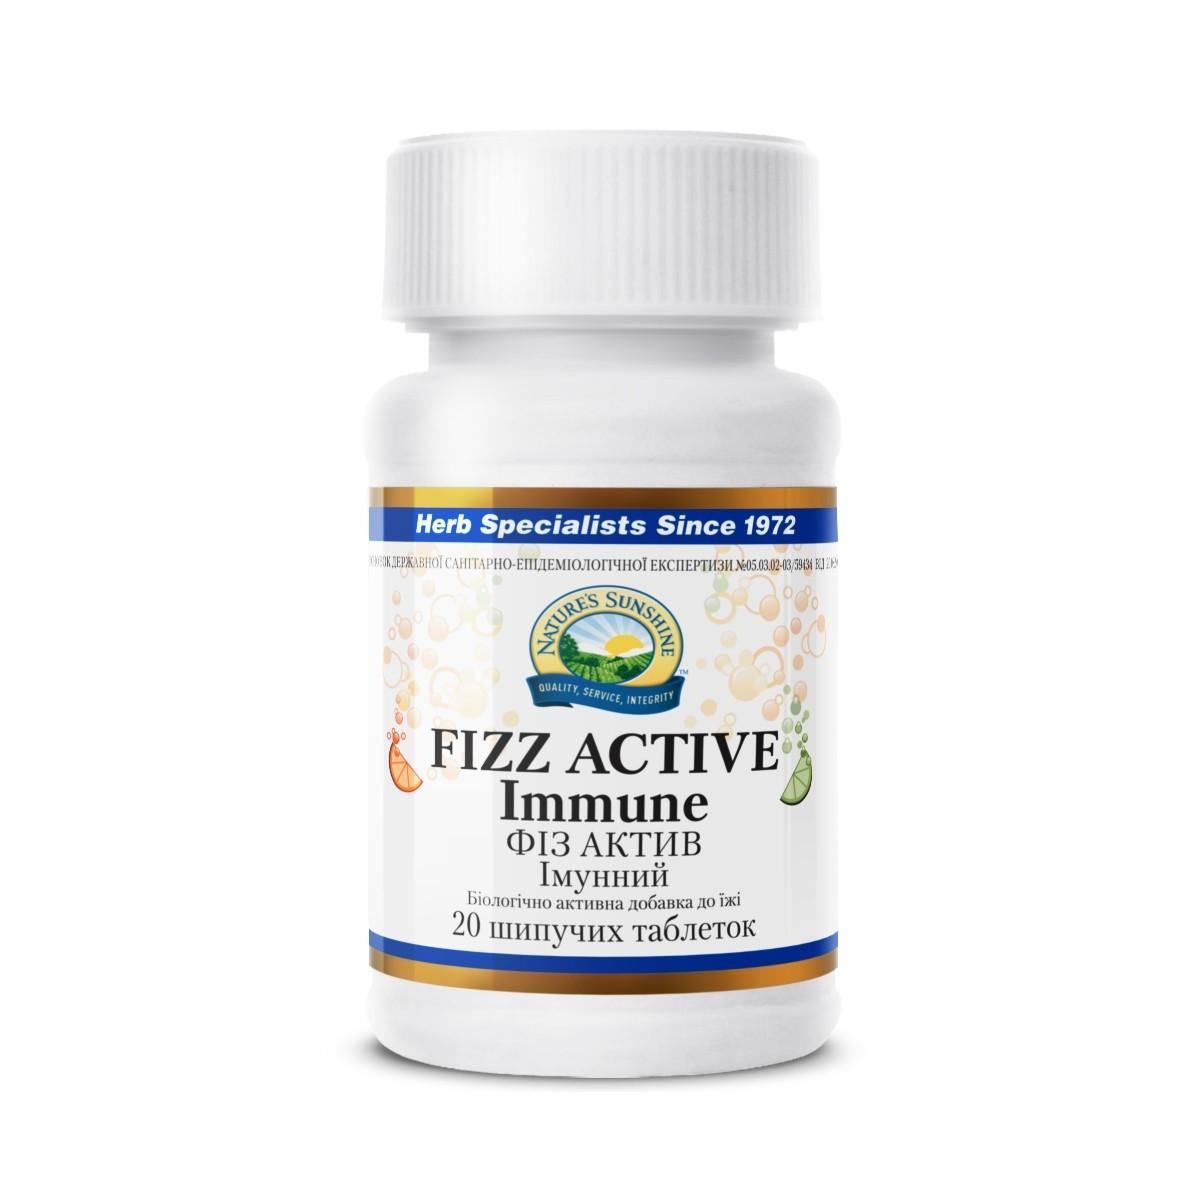 Биологически активная добавка Физ Актив иммунный, 20 шипучих таблеток, Fizz Active, NSP, США